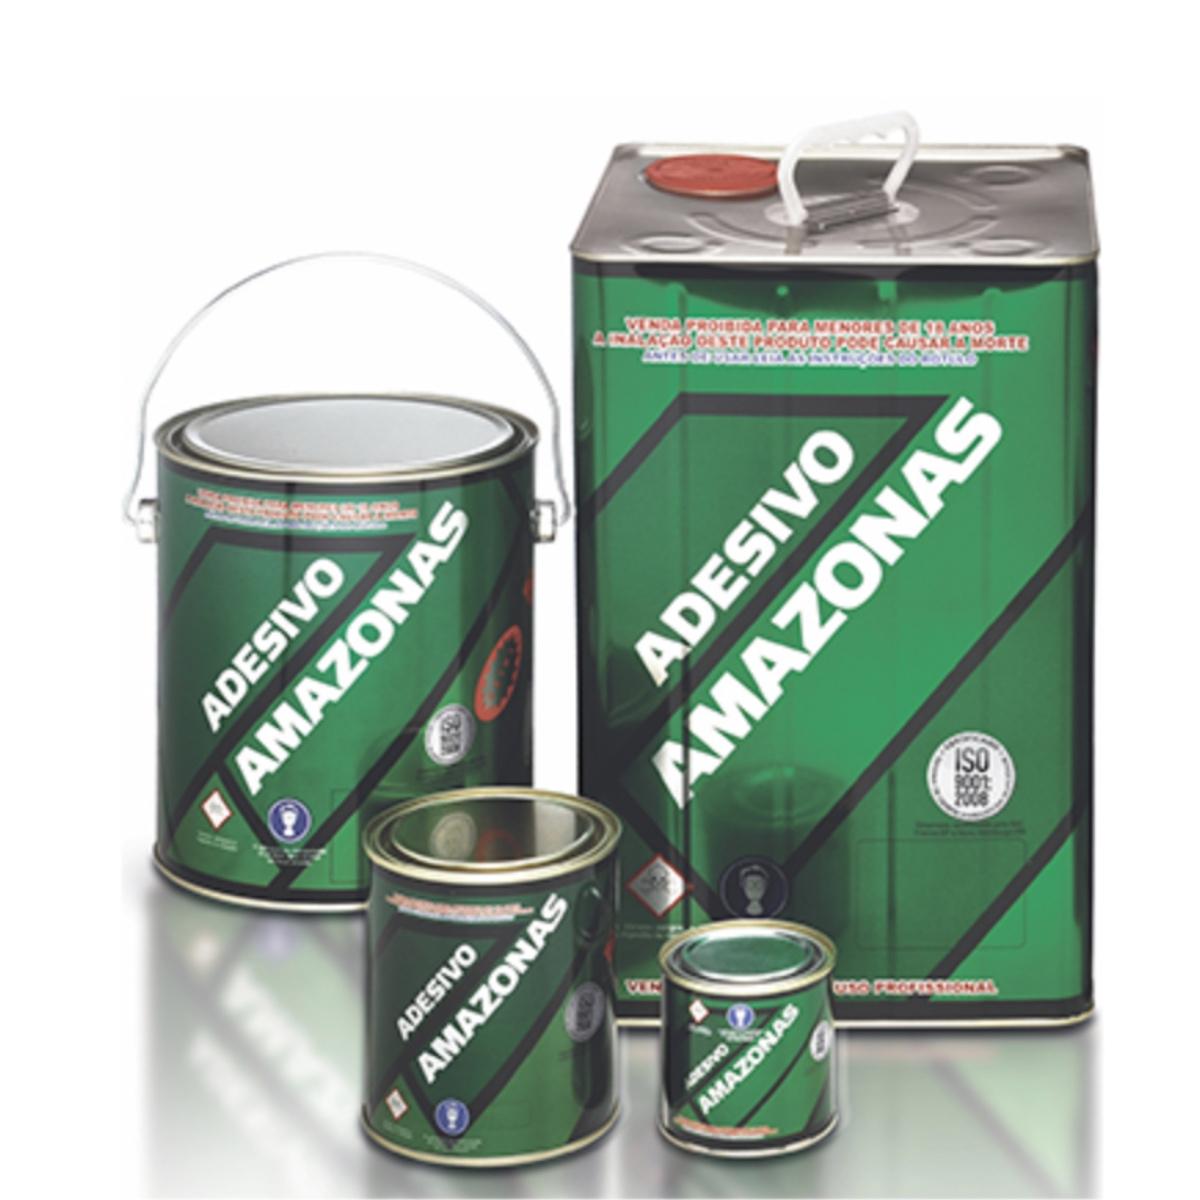 Cola De Contato Extra Universal De Sapateiro Amazonas